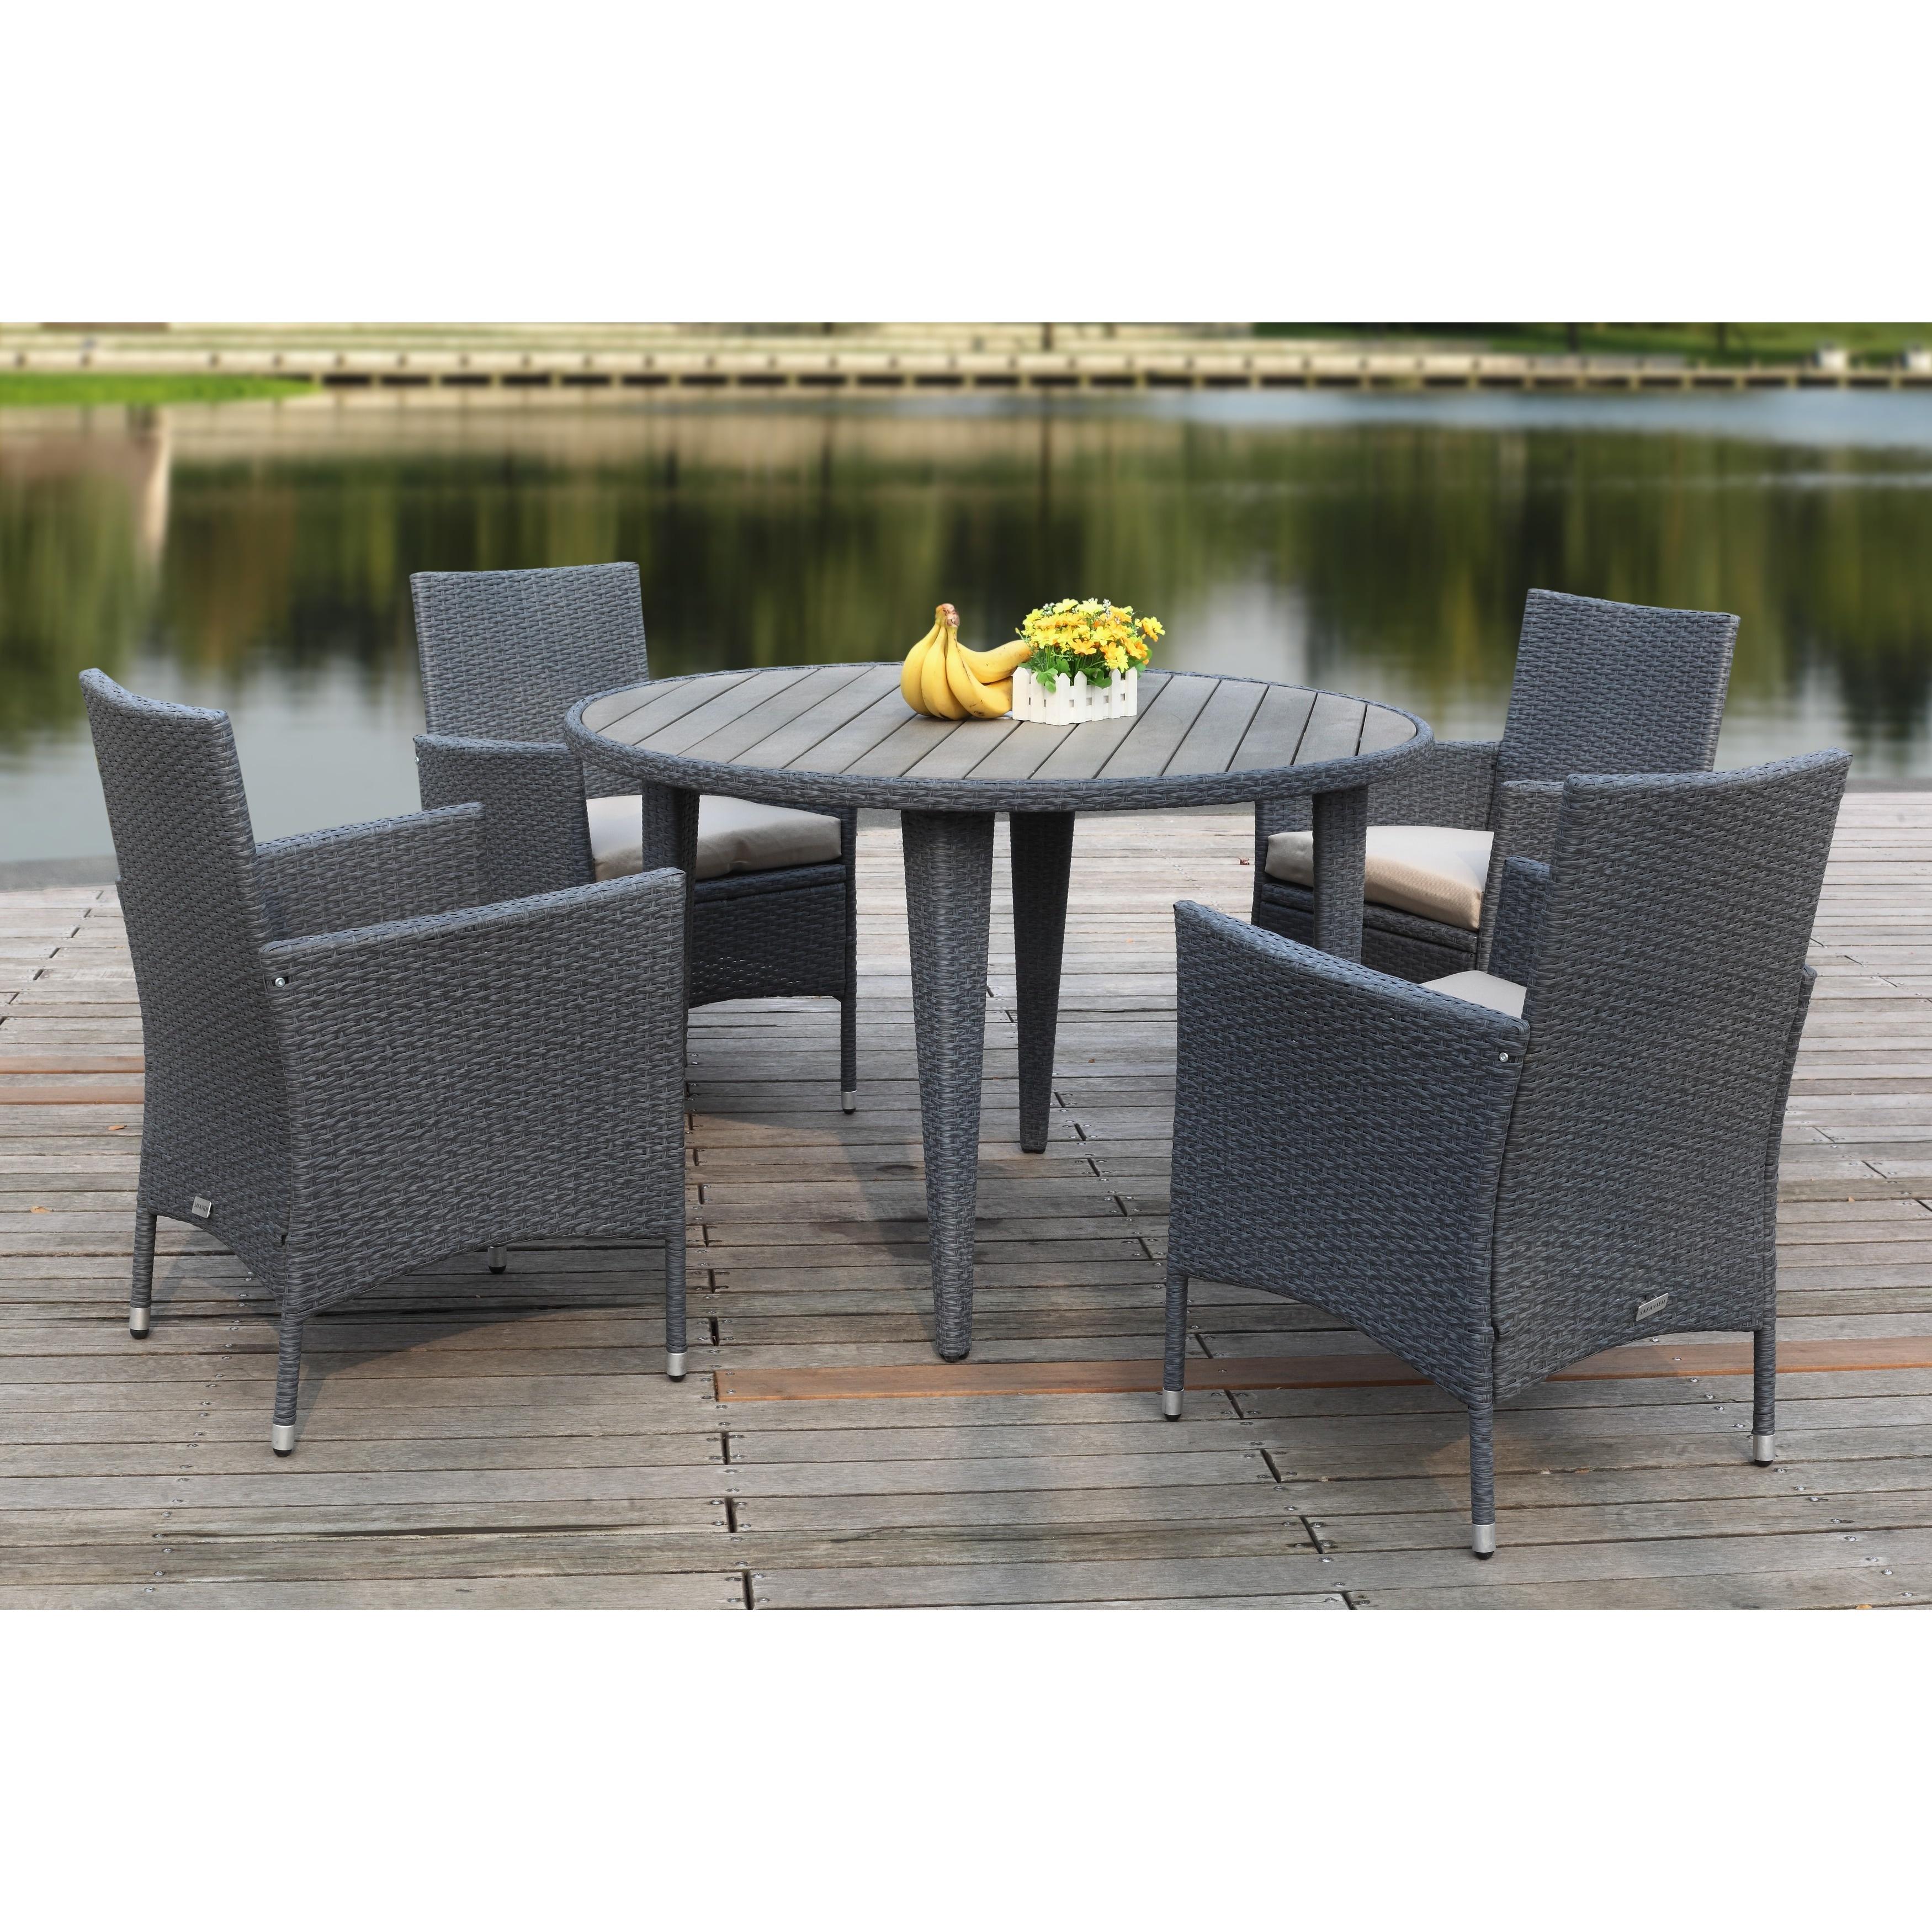 Shop Safavieh Outdoor Living Cooley Titanium Sand Dining Set 5